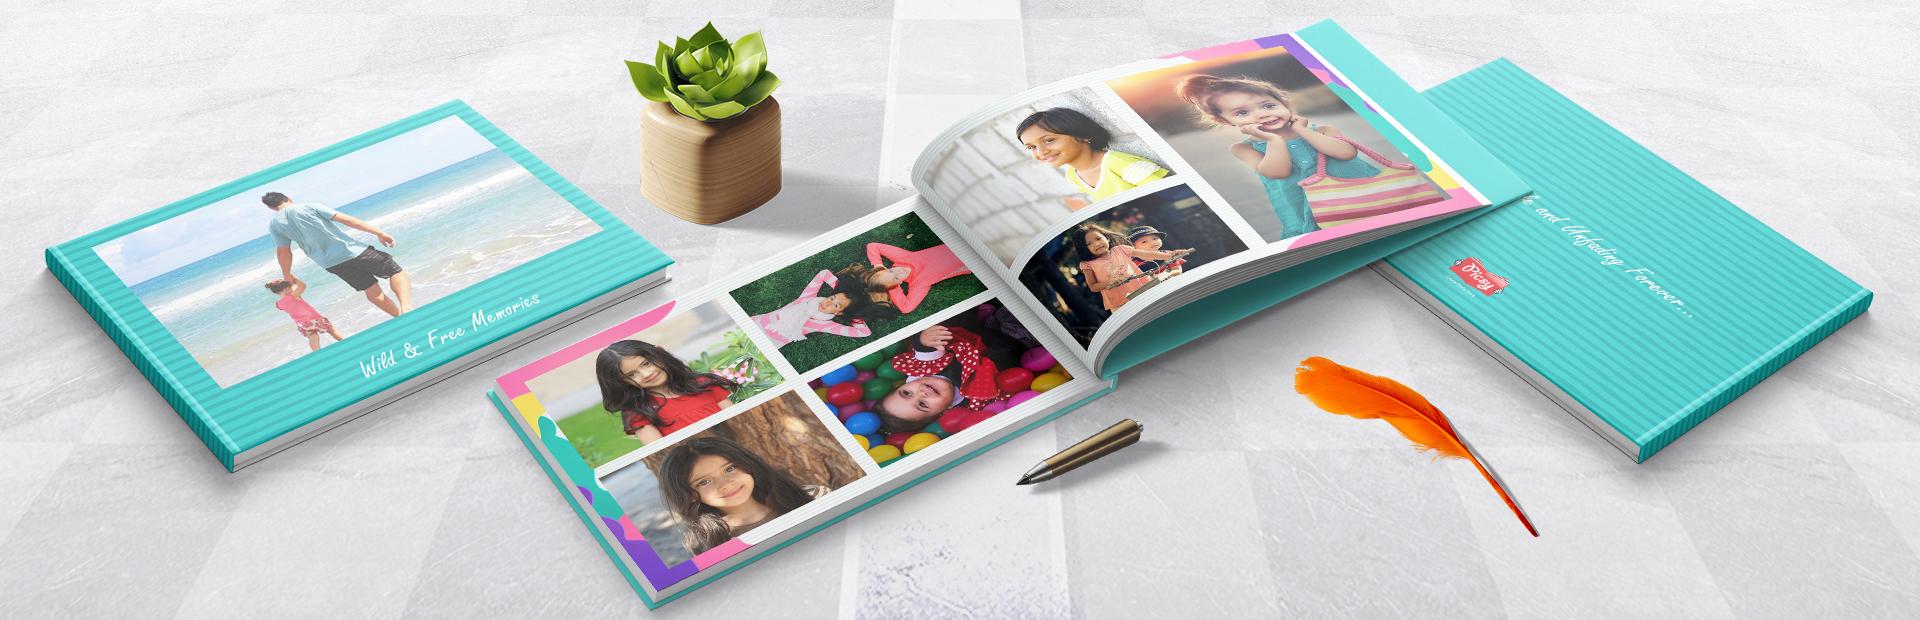 Happy to go jazzy Personalized Photo Books Online